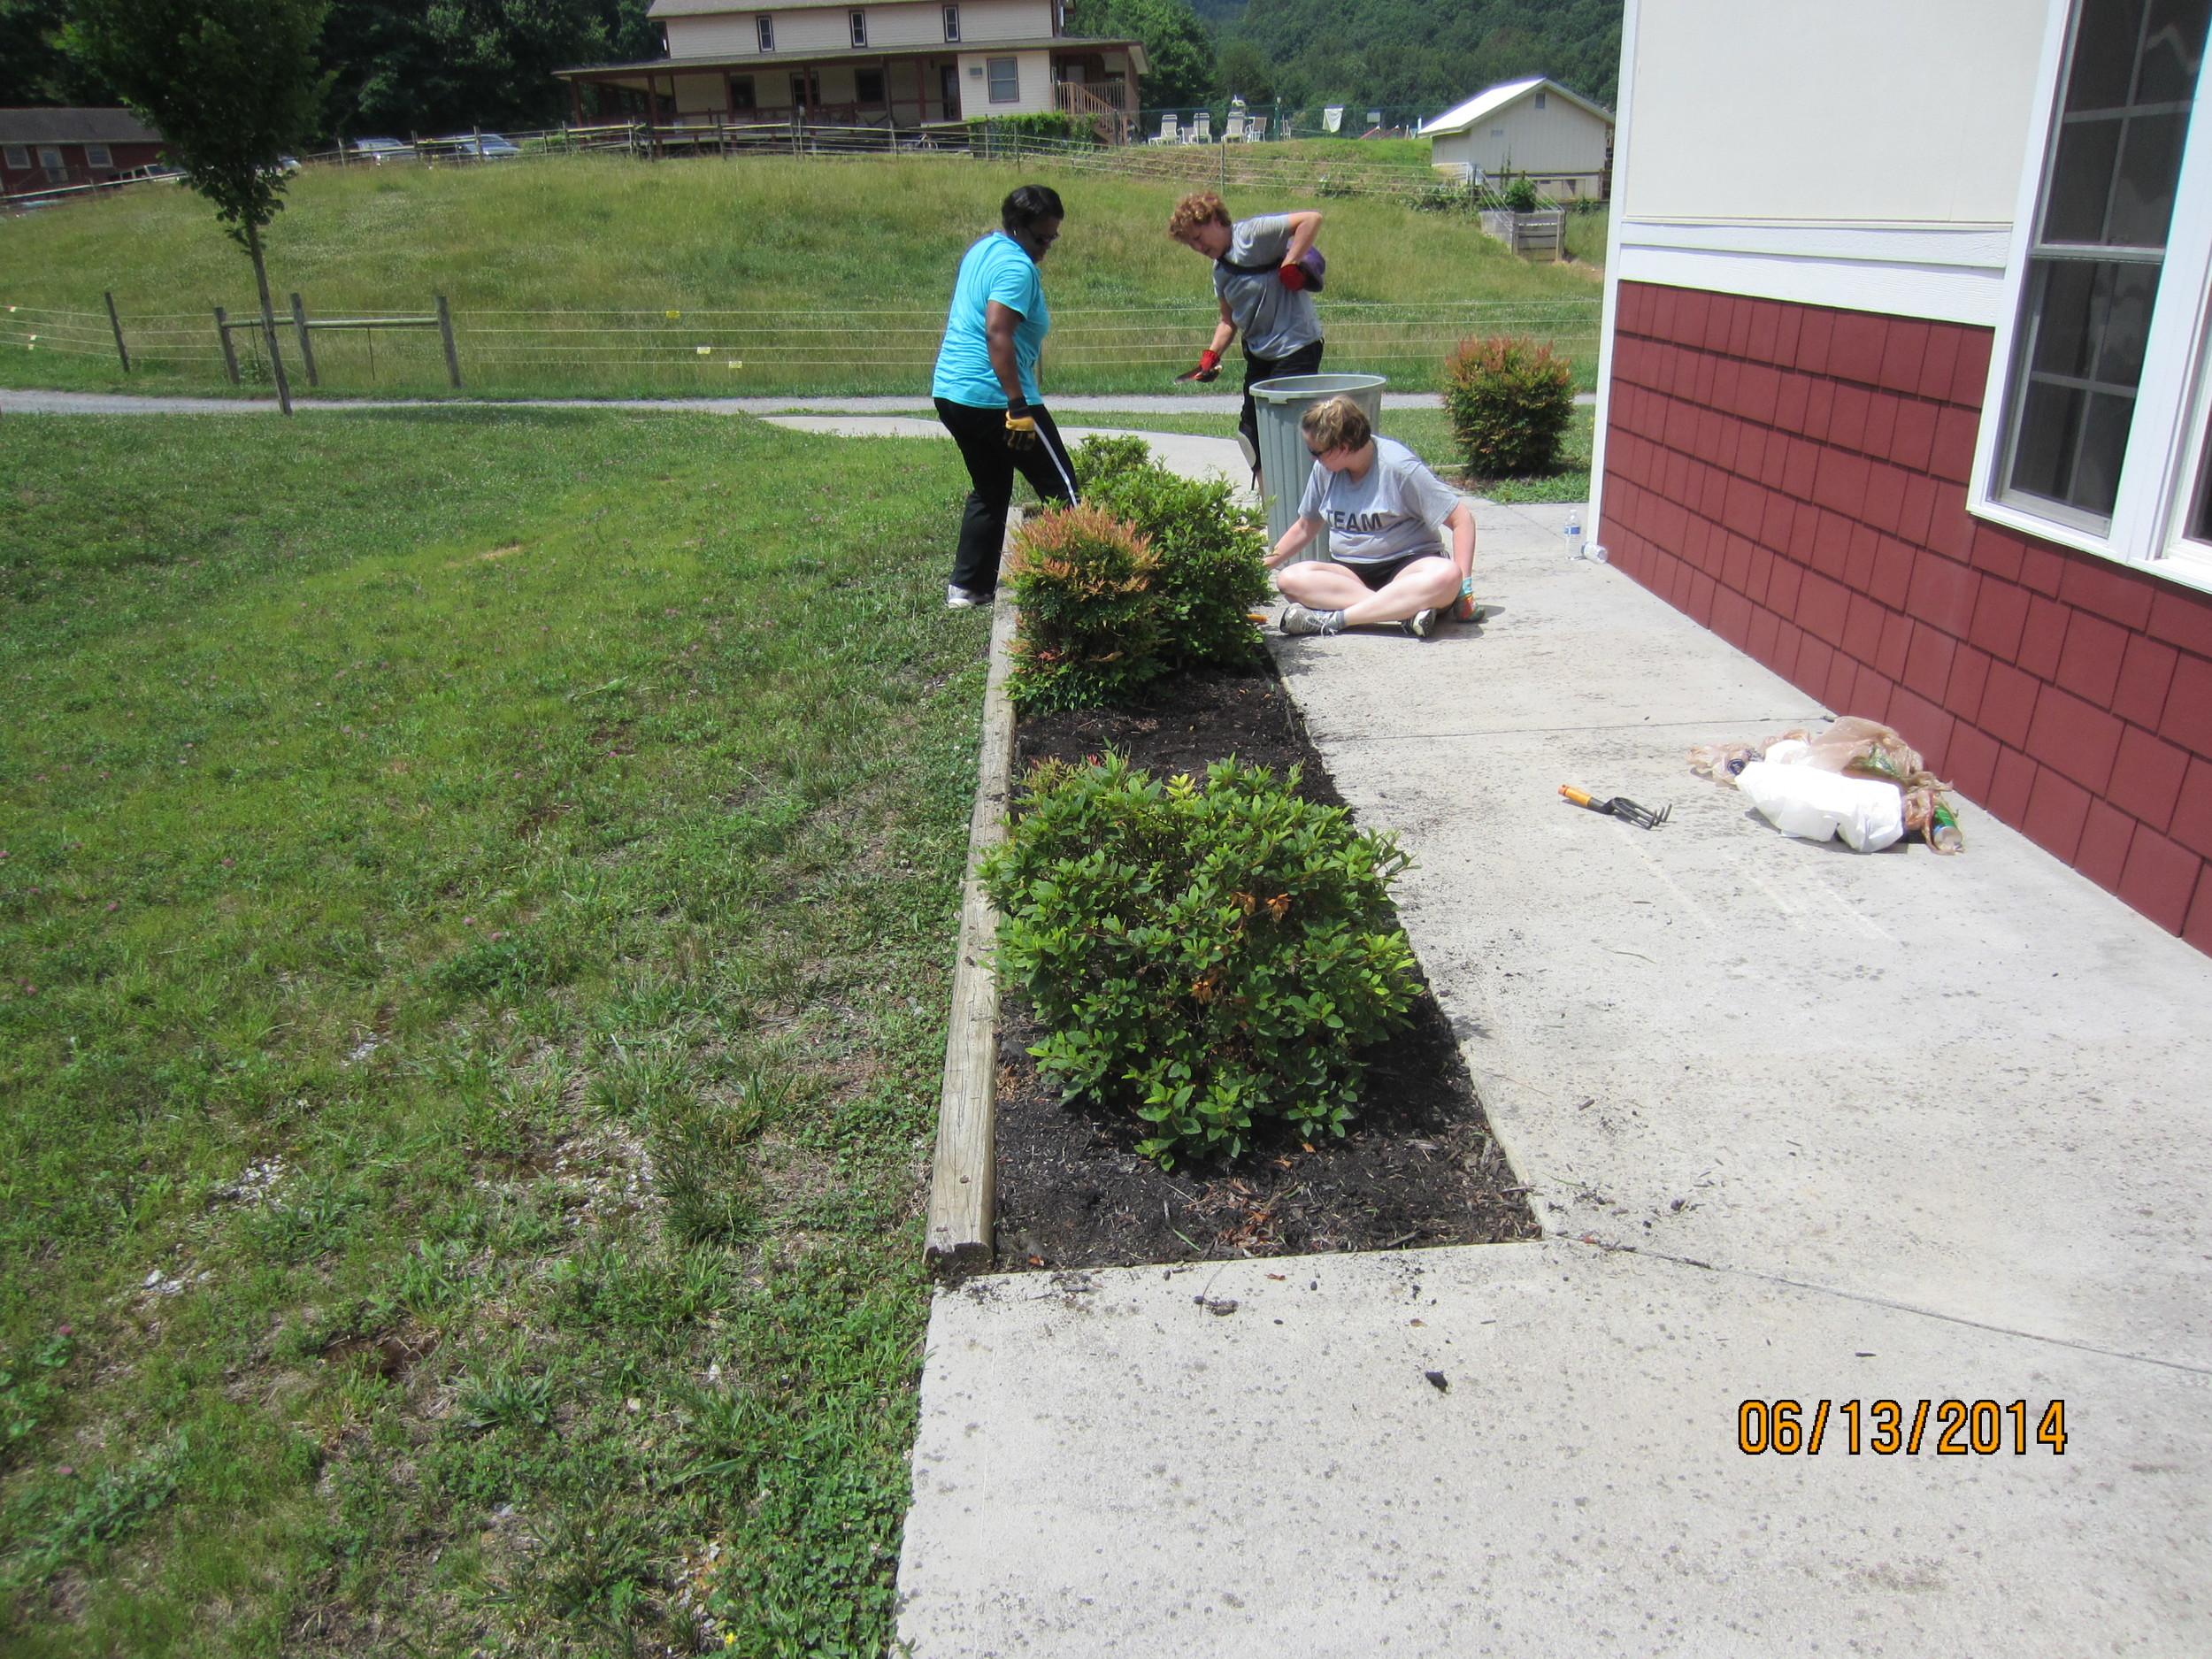 More weeding at the science building, Demetria Utley, Lauren Pearle and Nanci Scott.